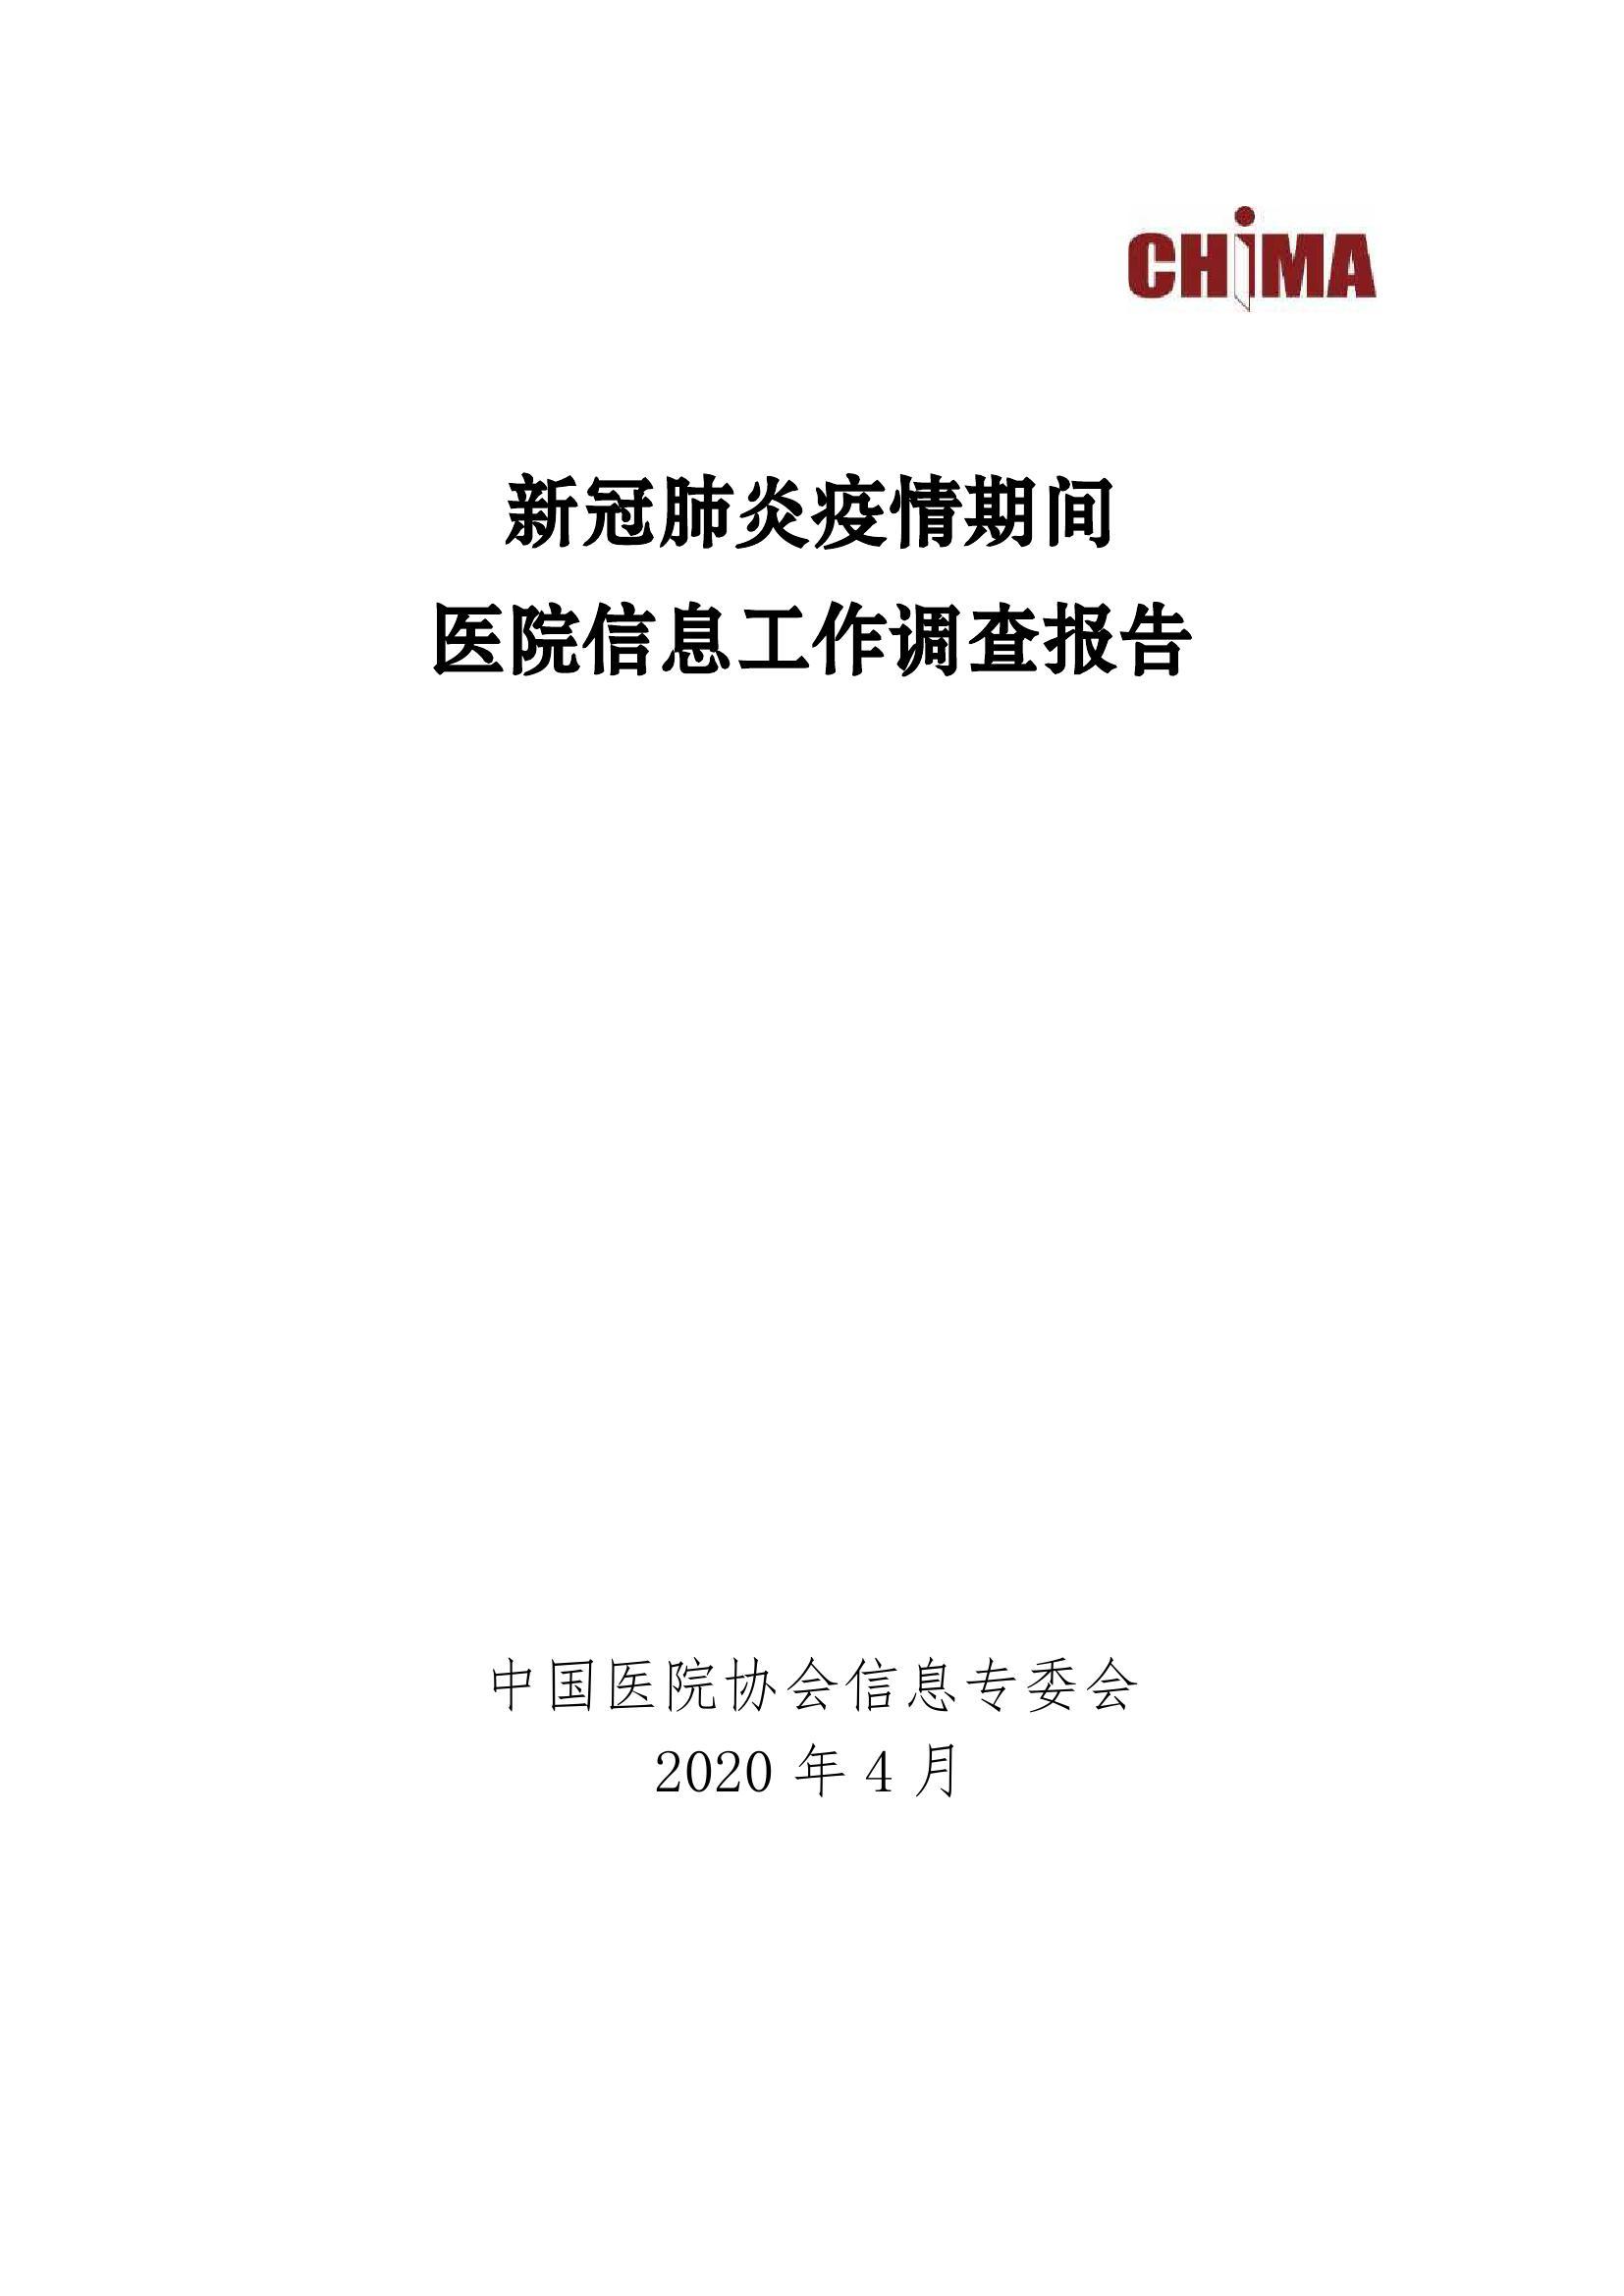 CHIMA:新冠肺炎疫情期间医院信息工作调查报告(附下载)